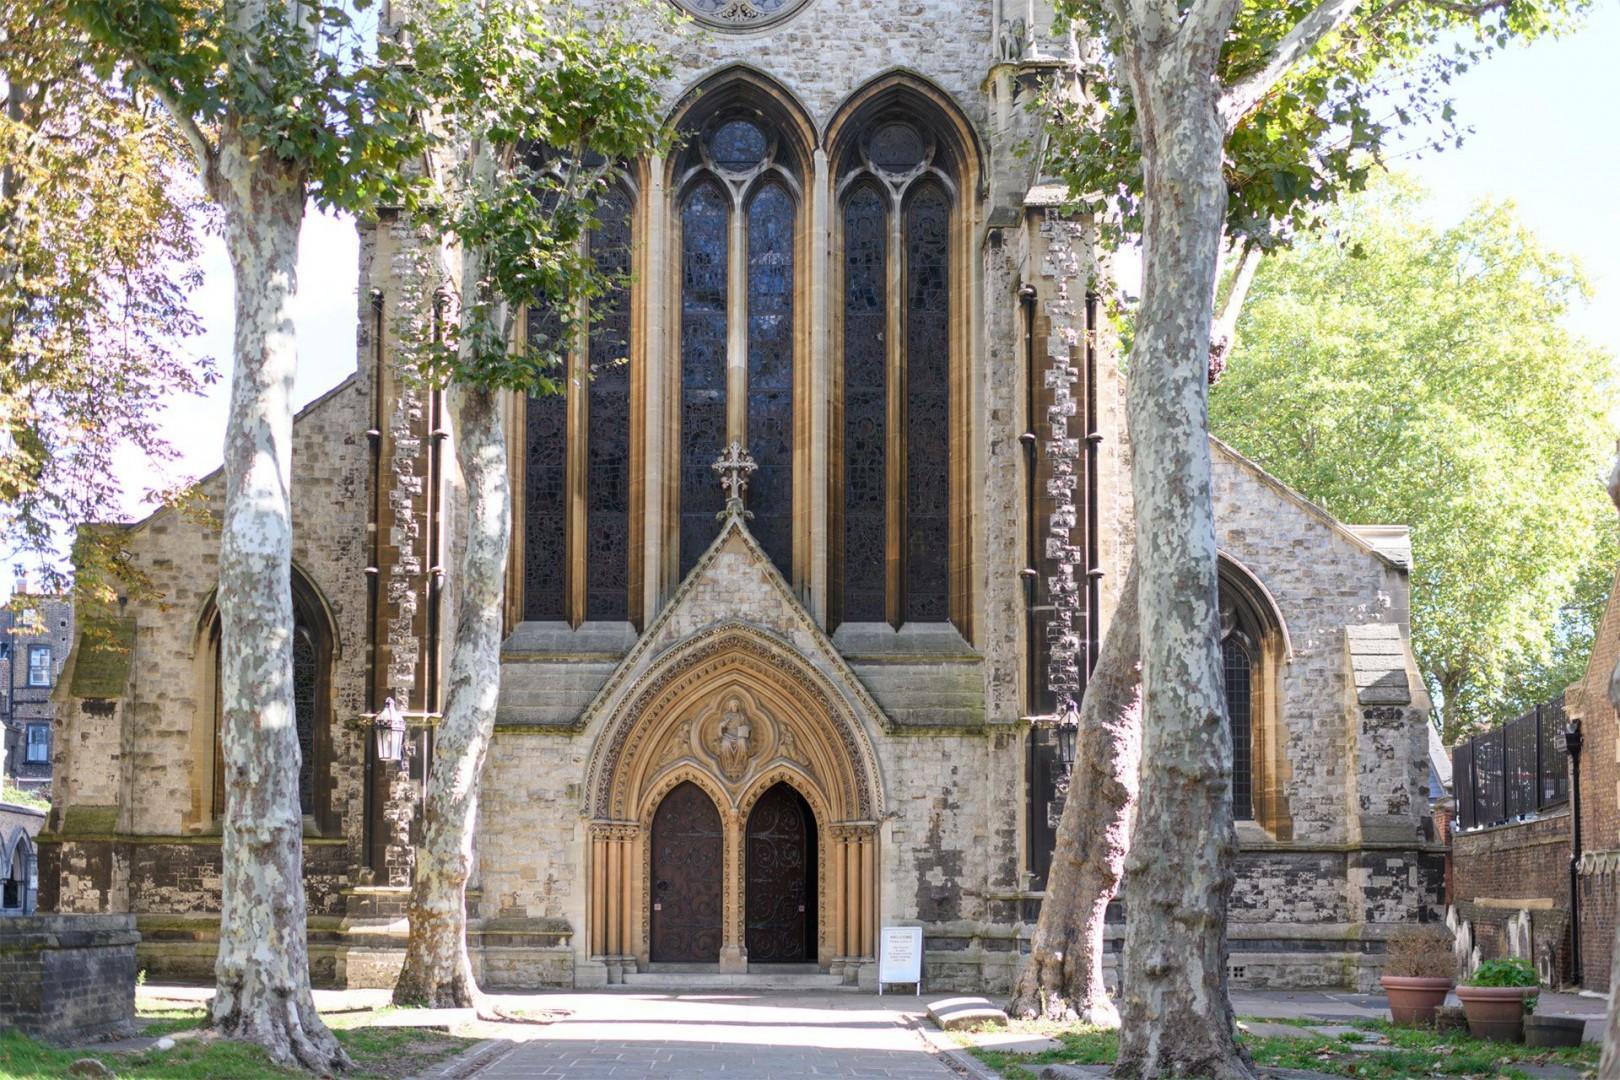 CMS-44-(Stunning old church just around the corner)-876728595-1543408167-gordon-neighborhood-new-16